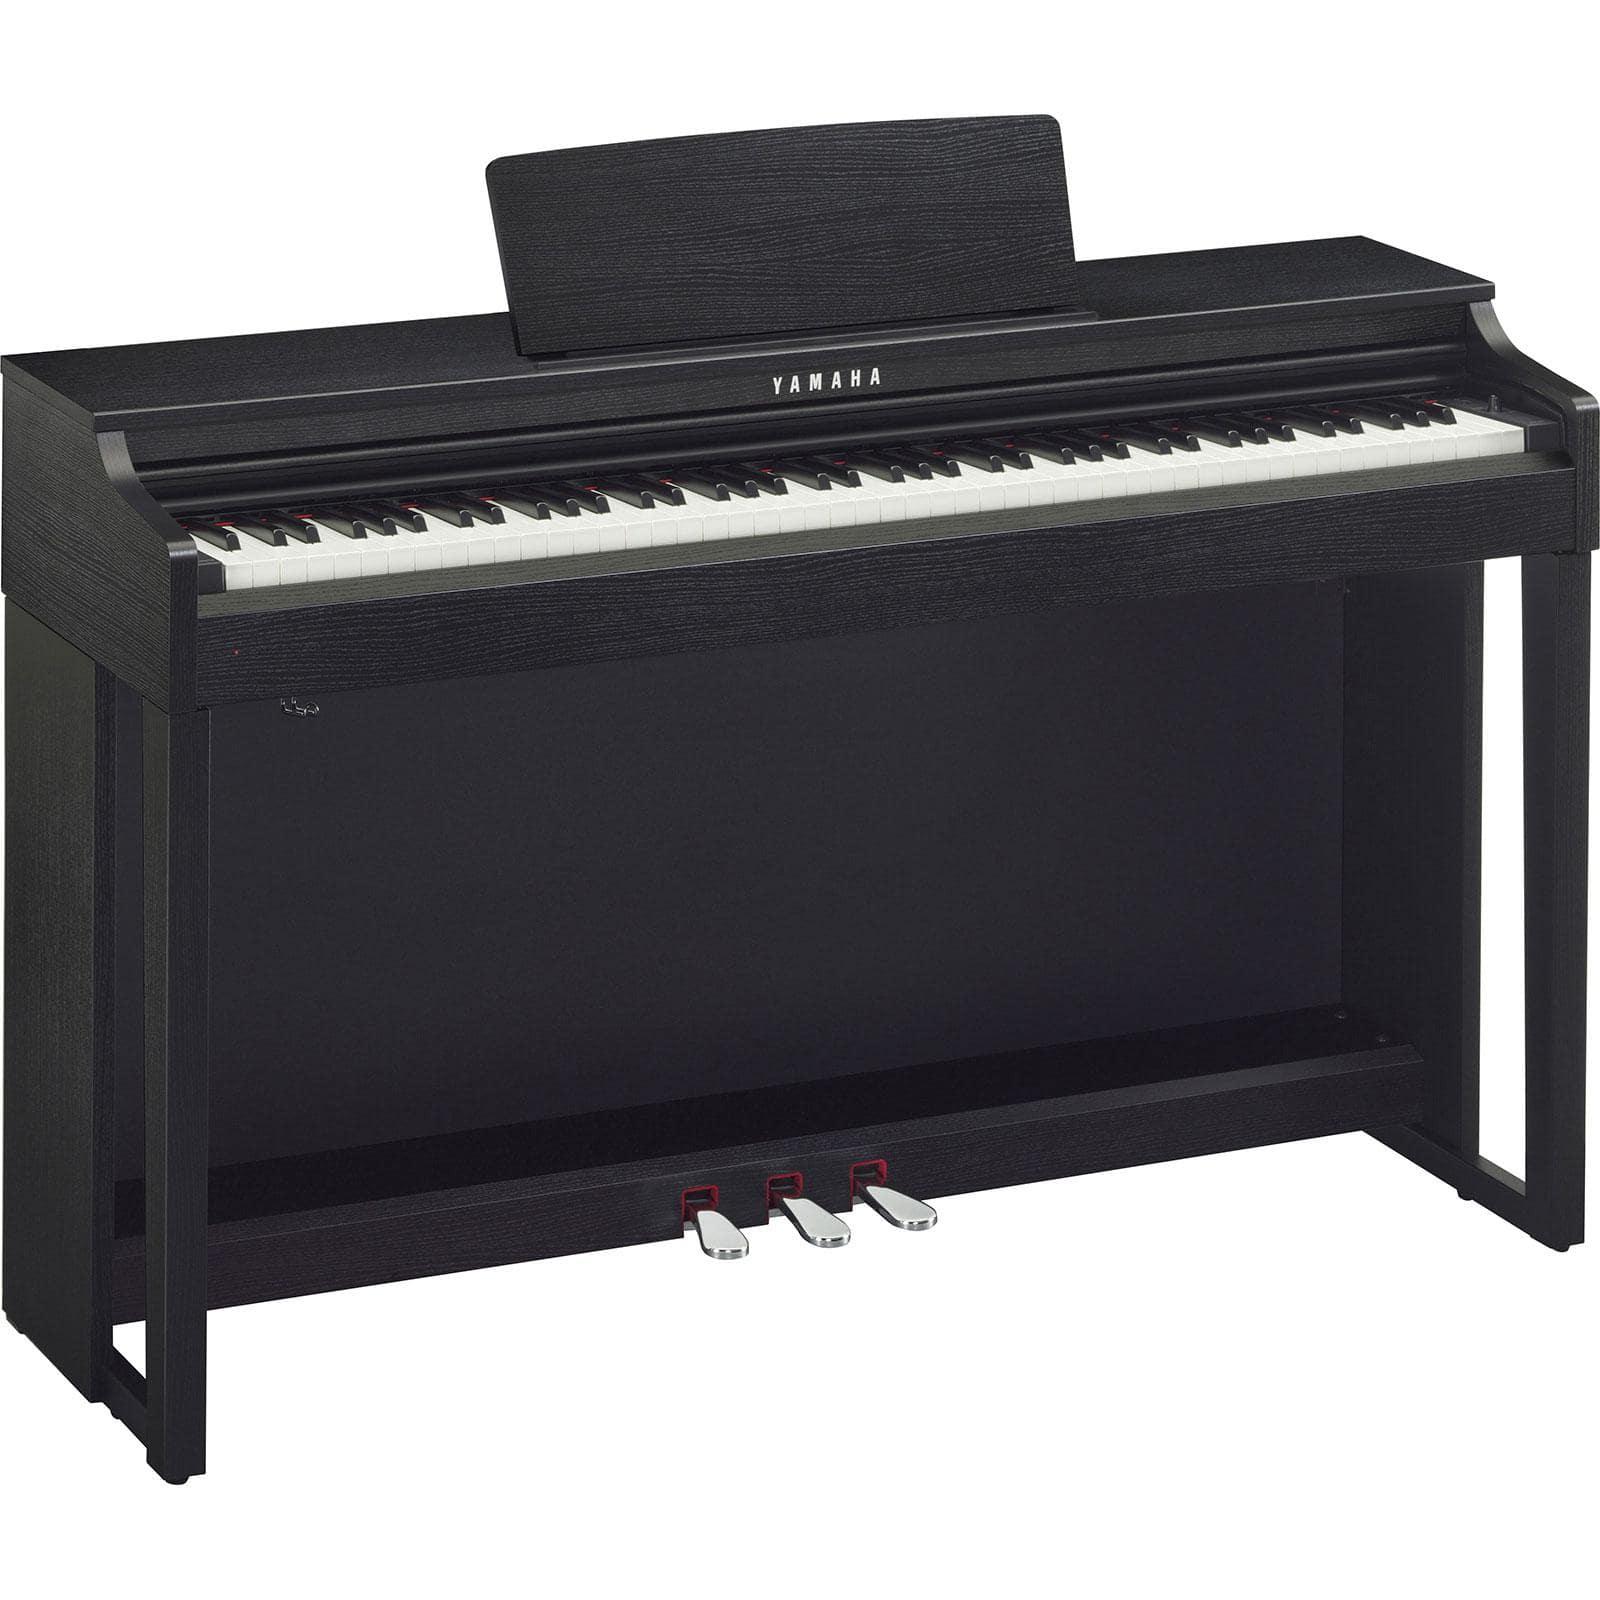 Yamaha CLP 625 B Digitalpiano schwarznuss